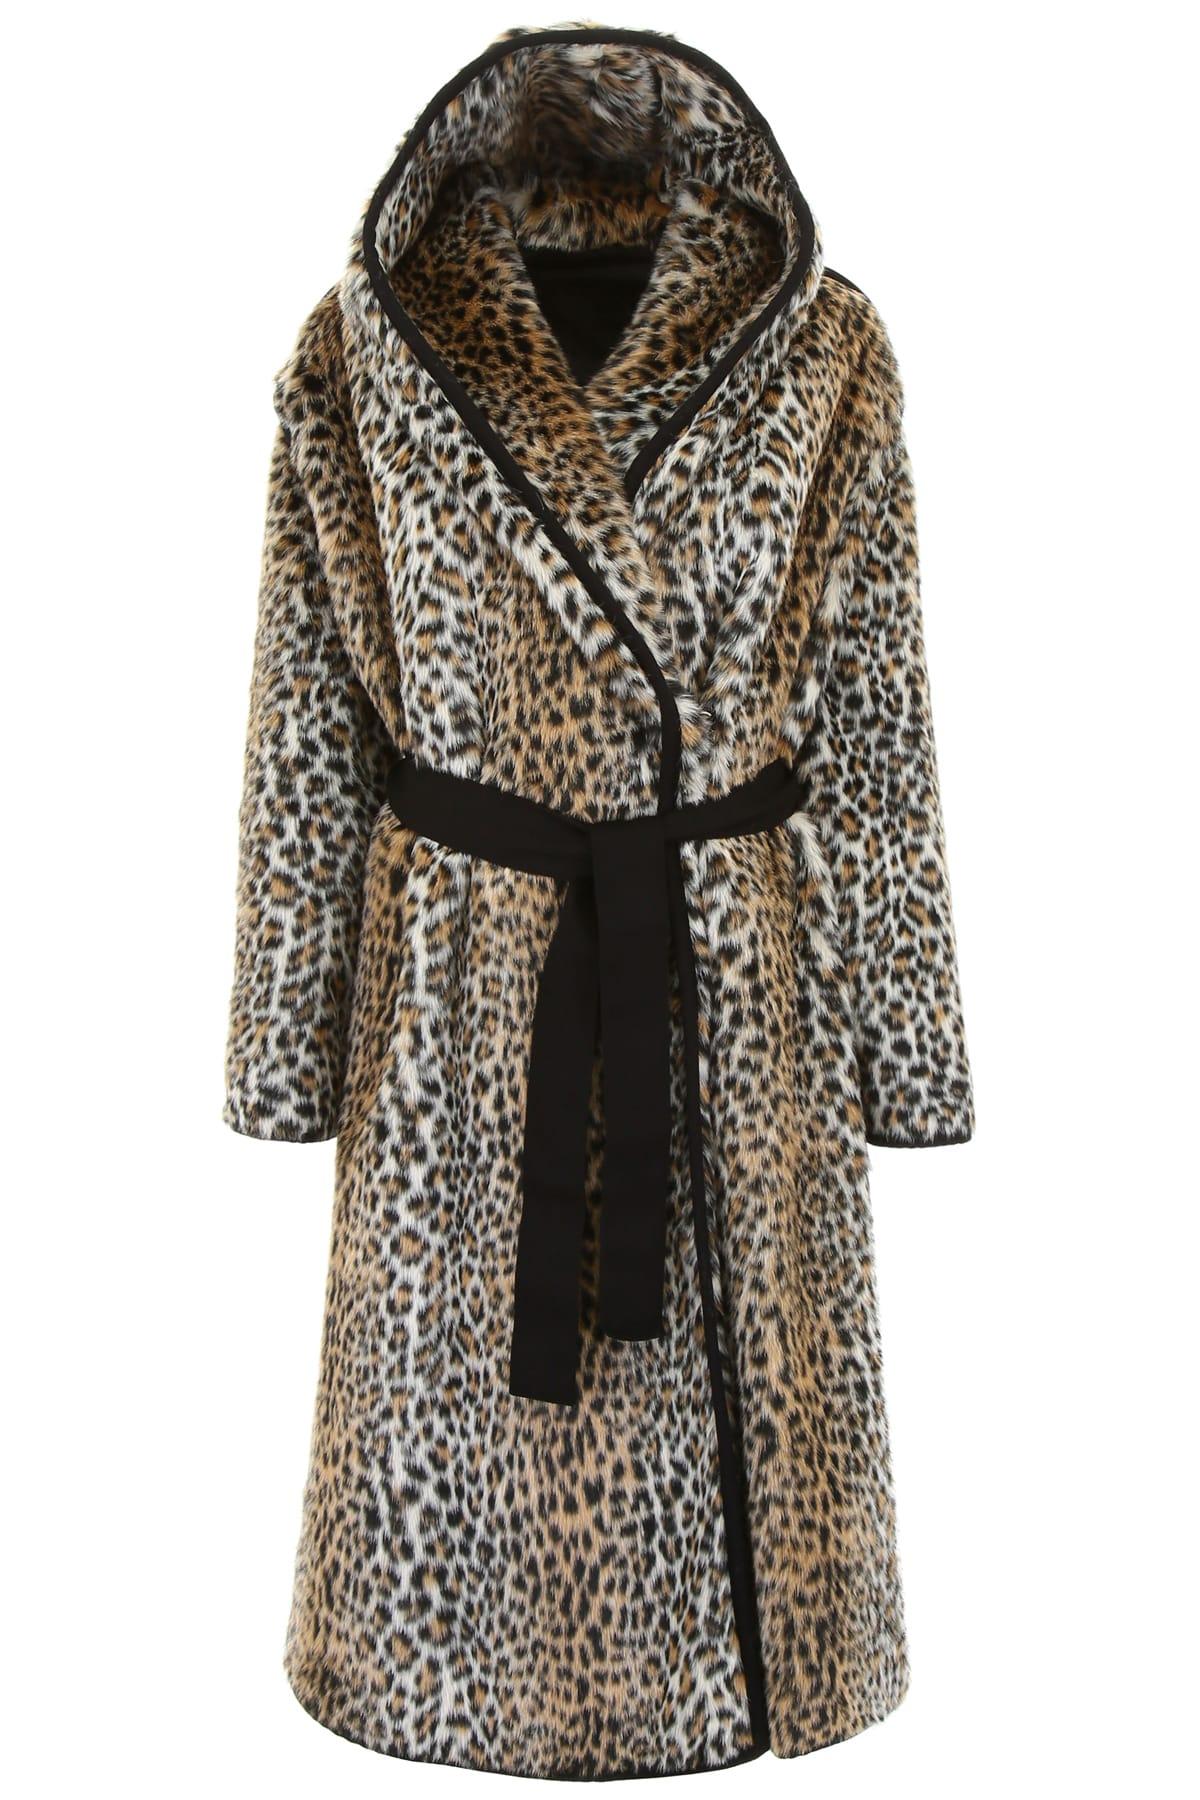 Philosophy di Lorenzo Serafini Leopard Printed Faux Fur Coat